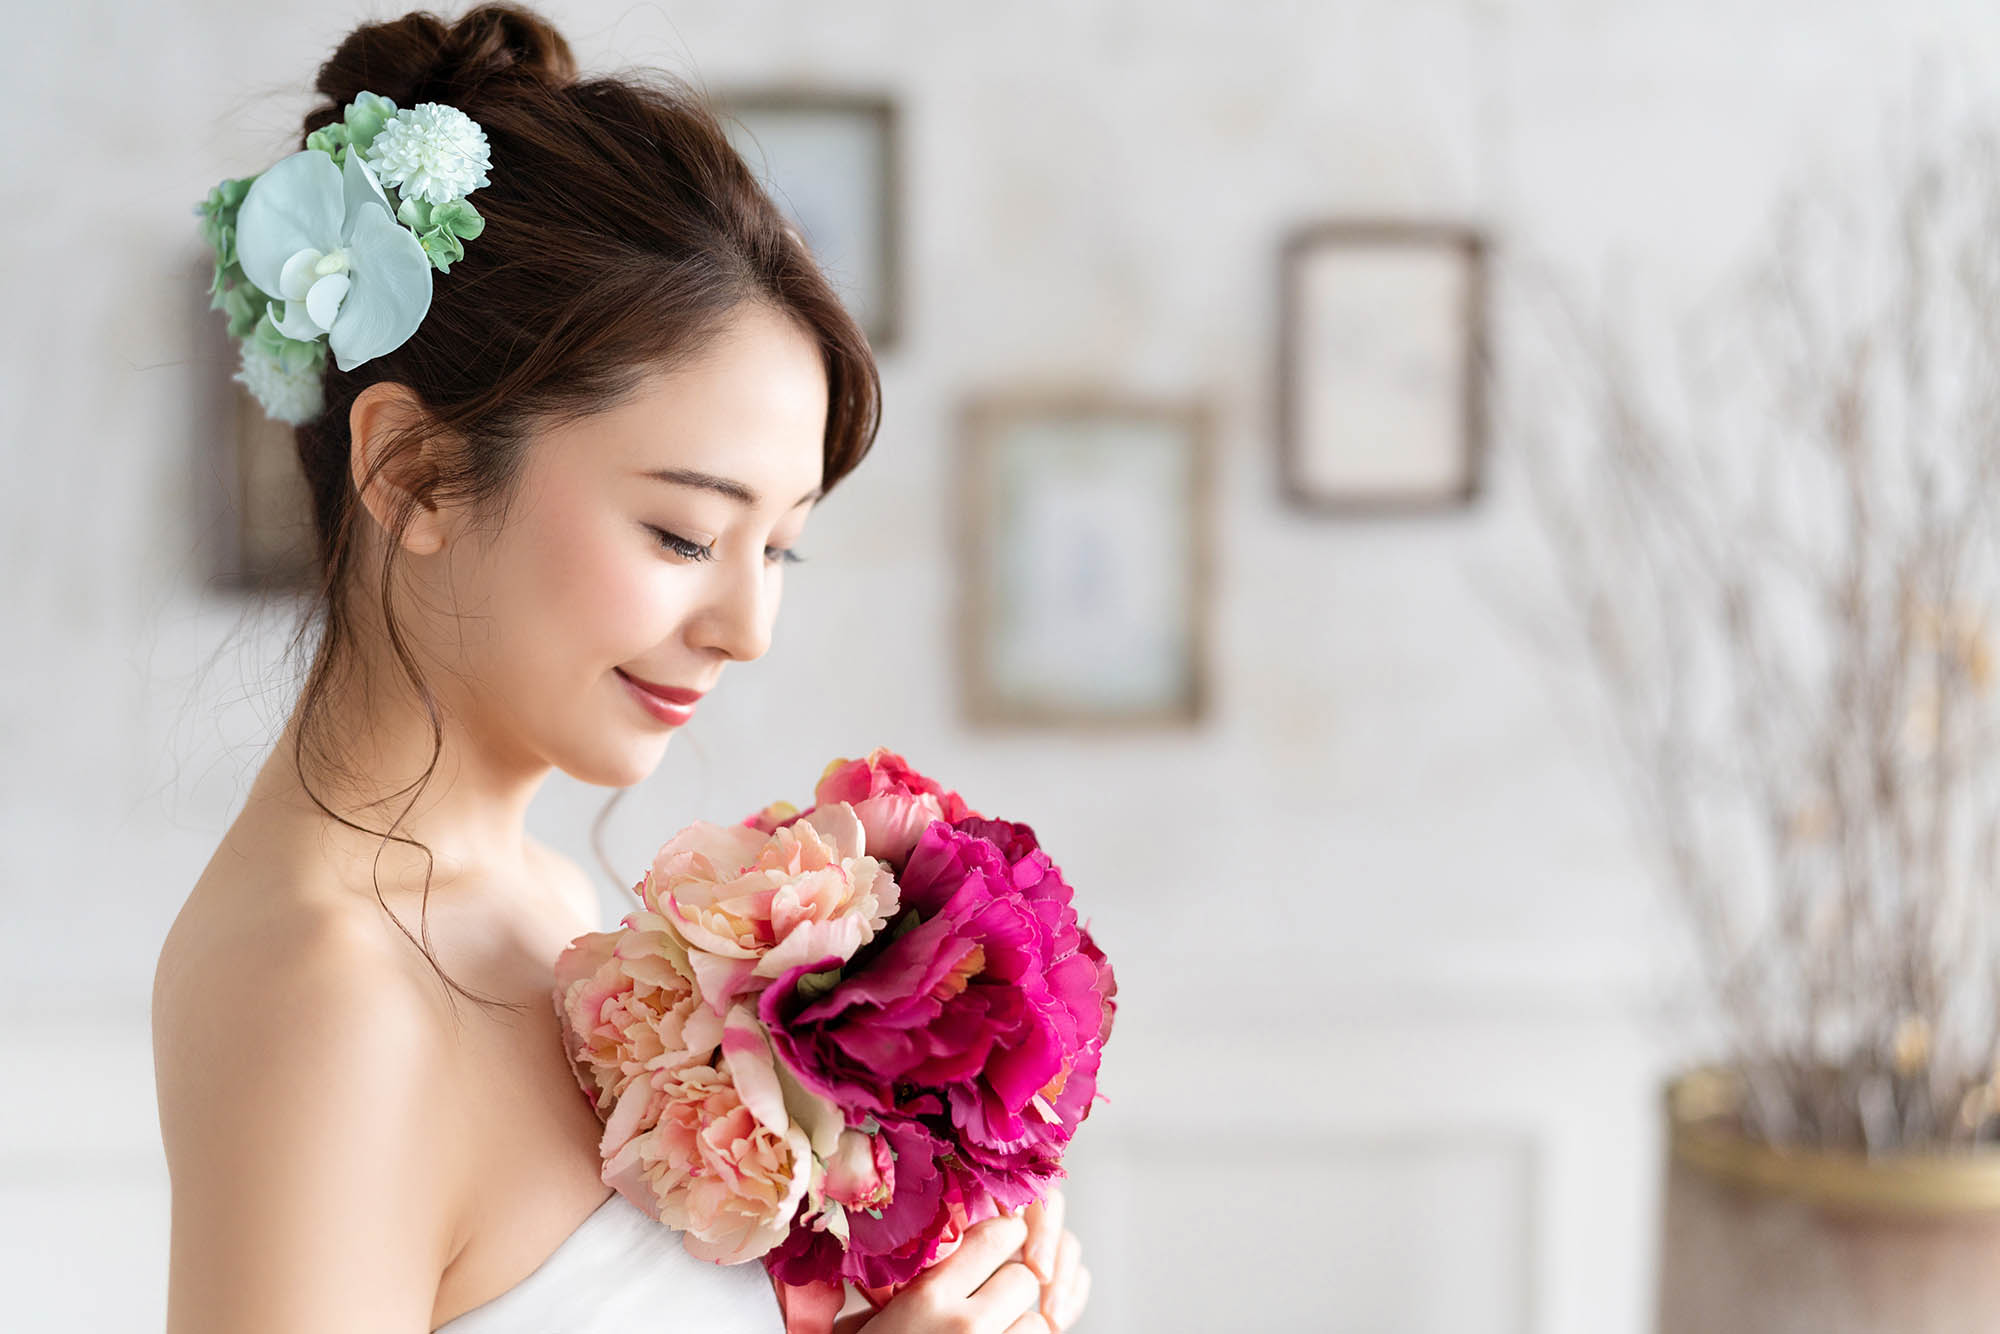 Bridal concept photography